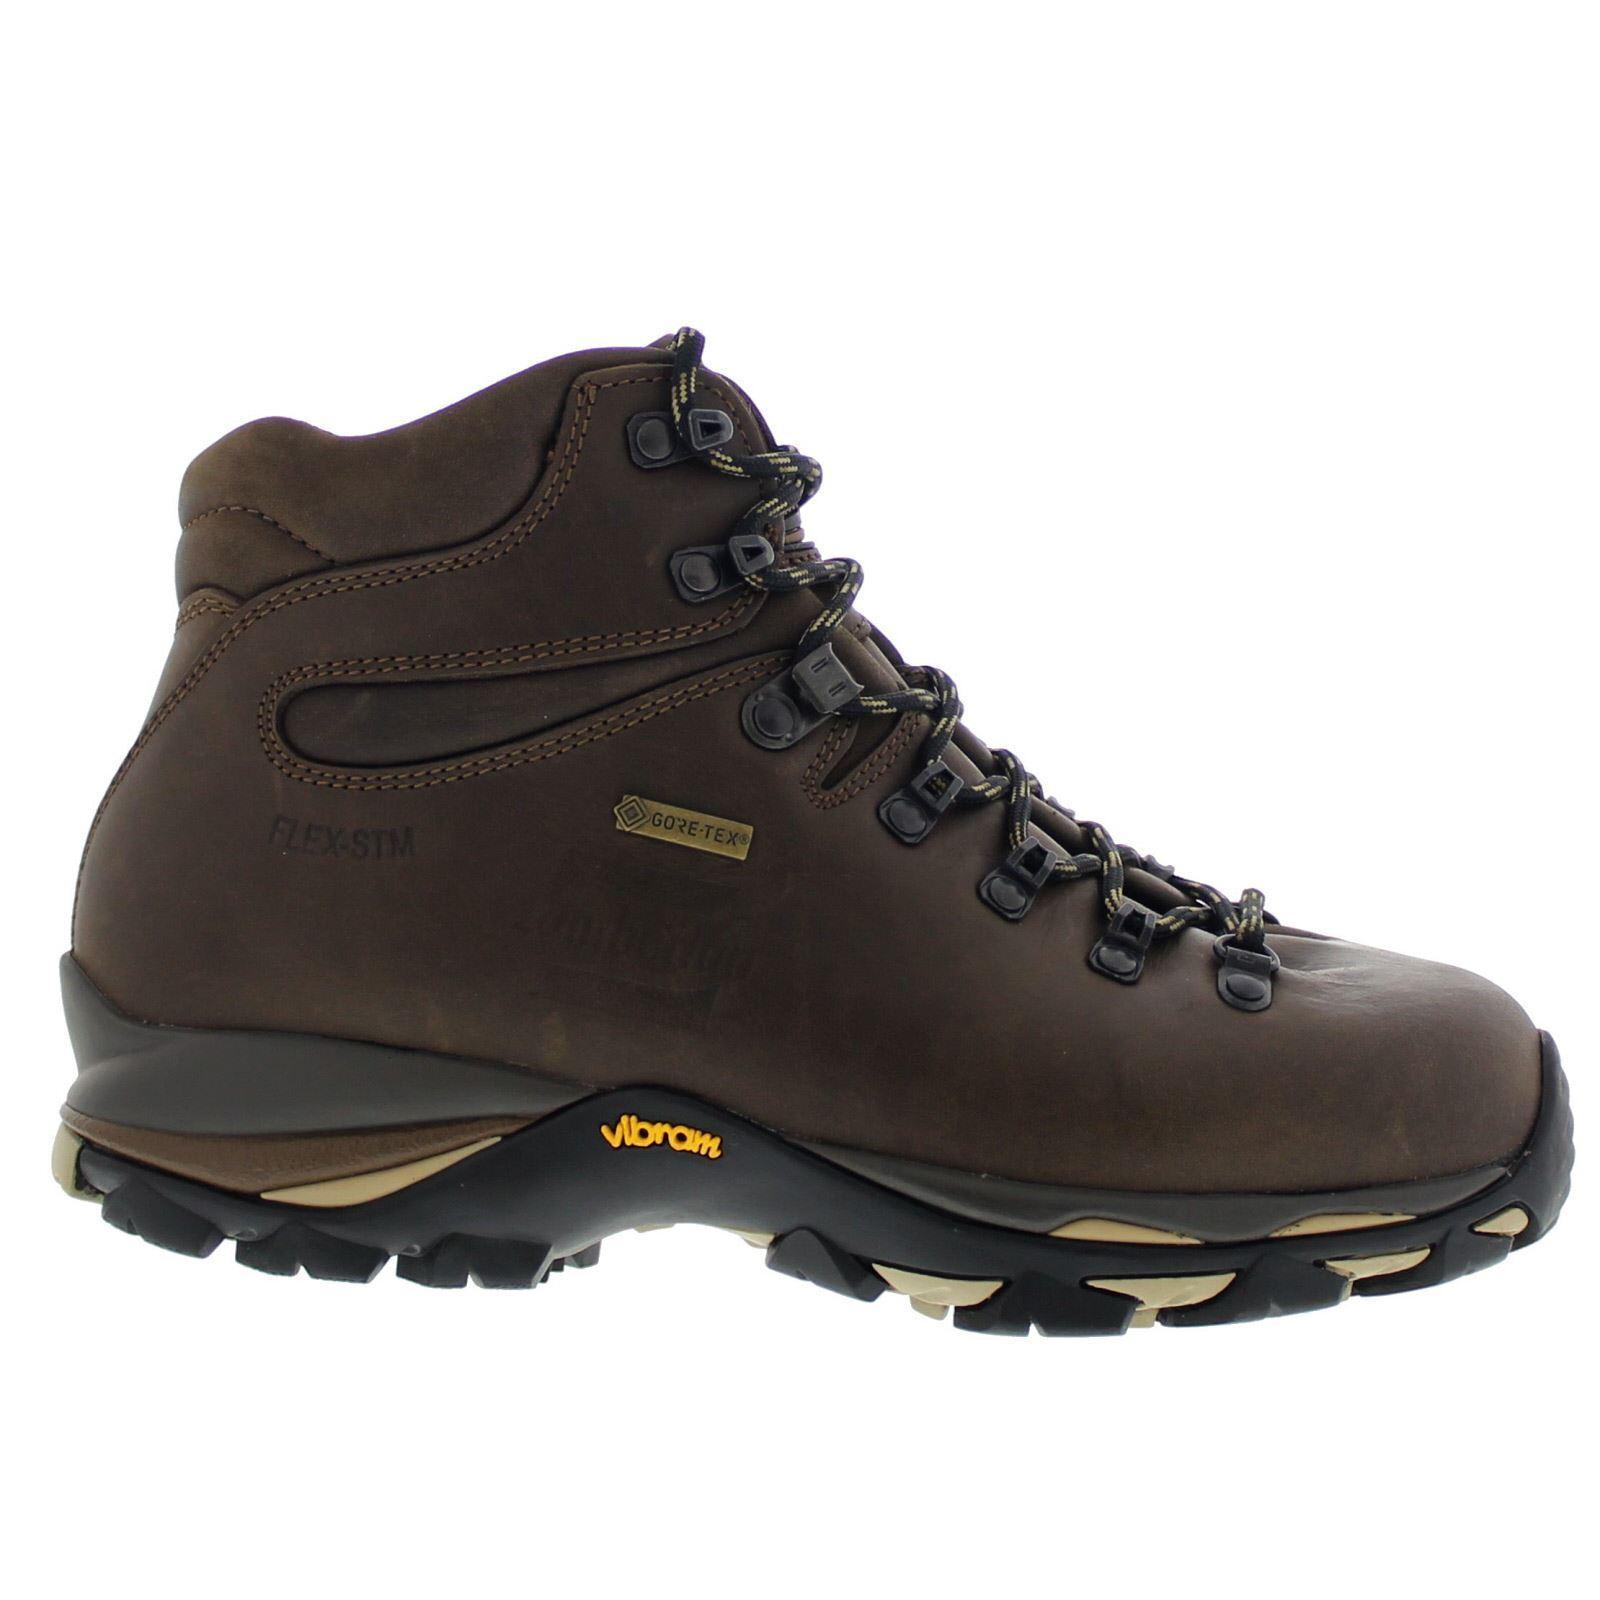 Grandes zapatos con descuento Zamberlan 313 Vioz Lite Gore-Tex Chestnut Womens - Mens Unisex Boots